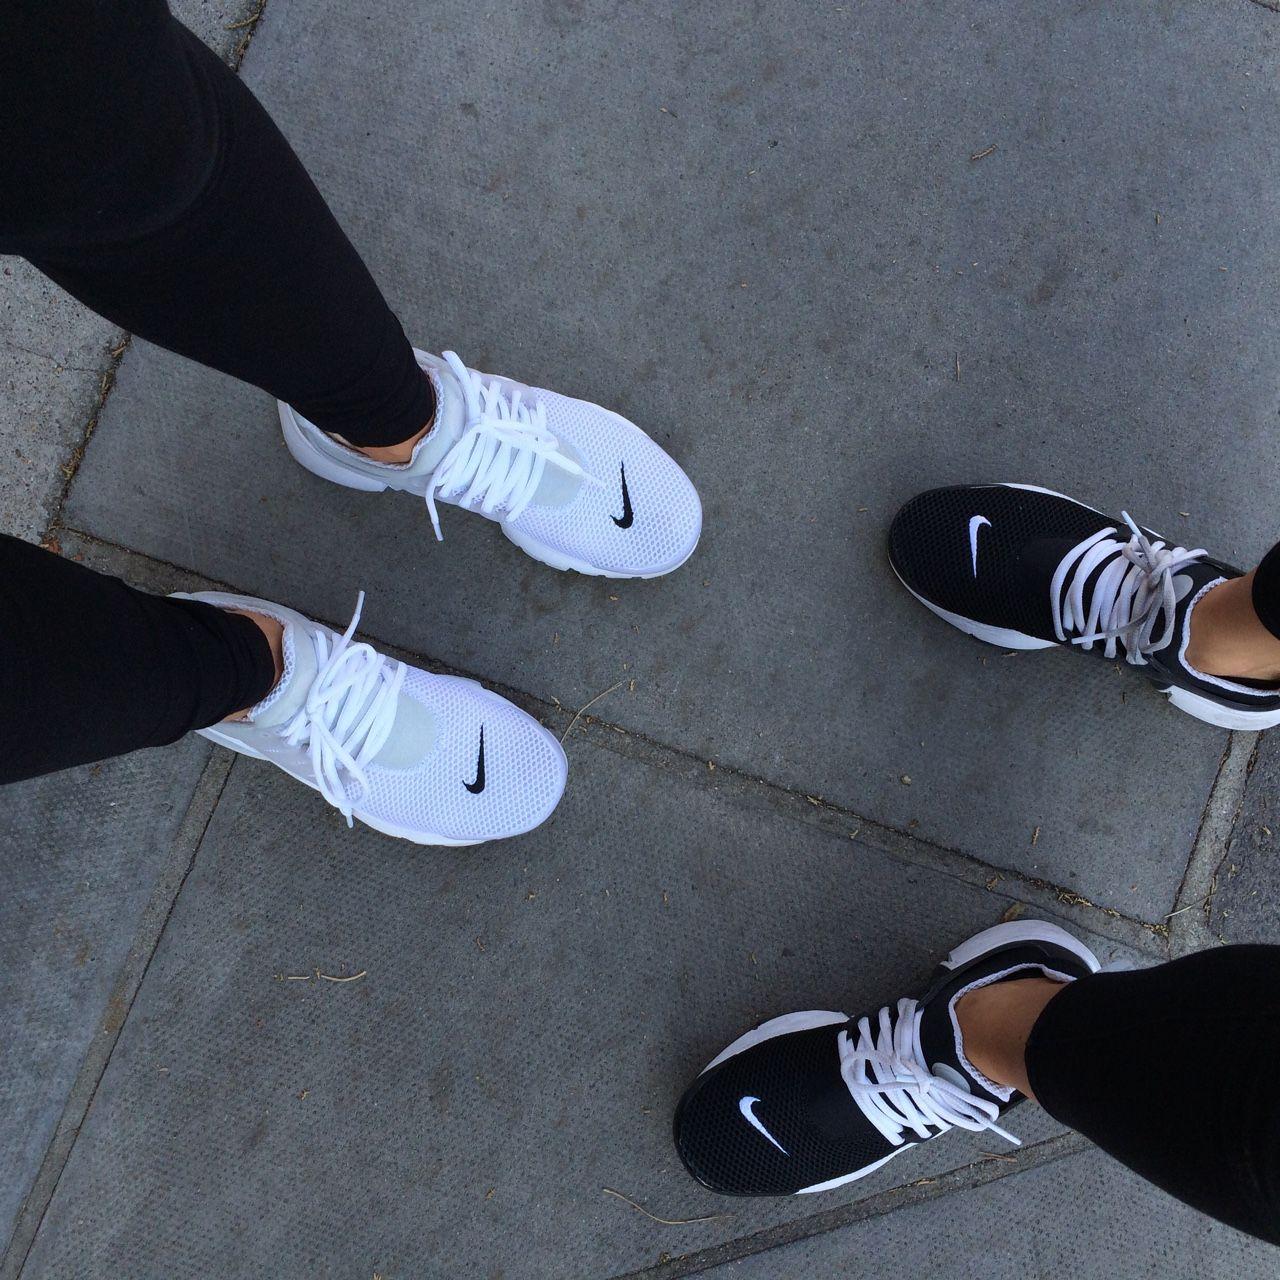 premium selection d8b2a 9e384 ... Best 25+ Nike presto 2015 ideas on Pinterest Nike air presto black, ...